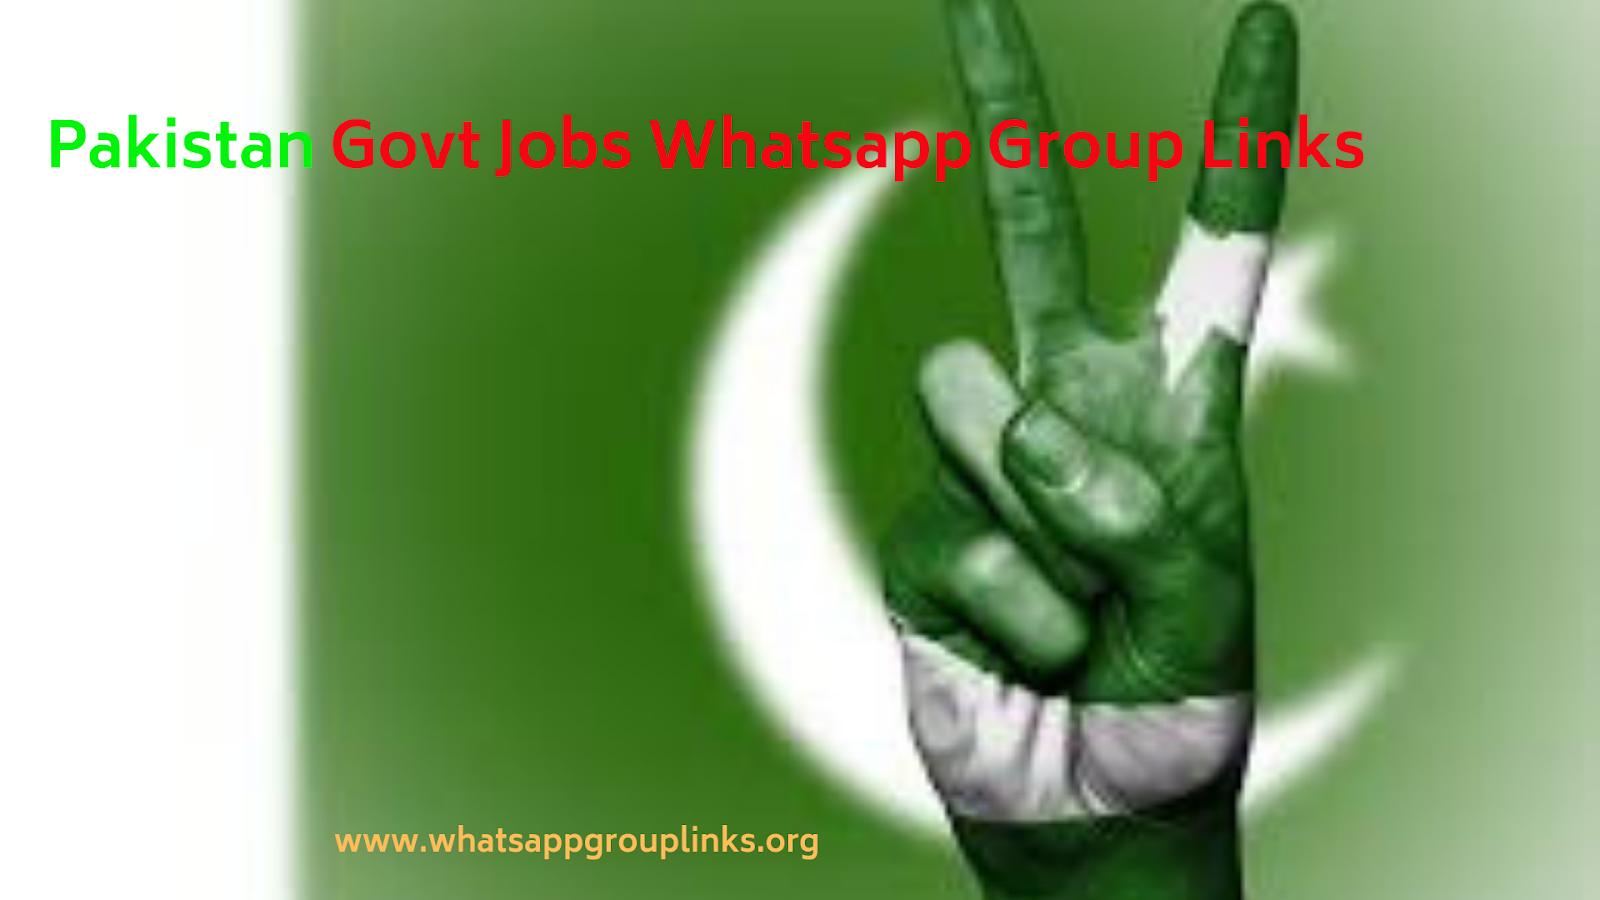 Join Pakistan Govt Jobs Whatsapp Group Links List - Whatsapp Group Links